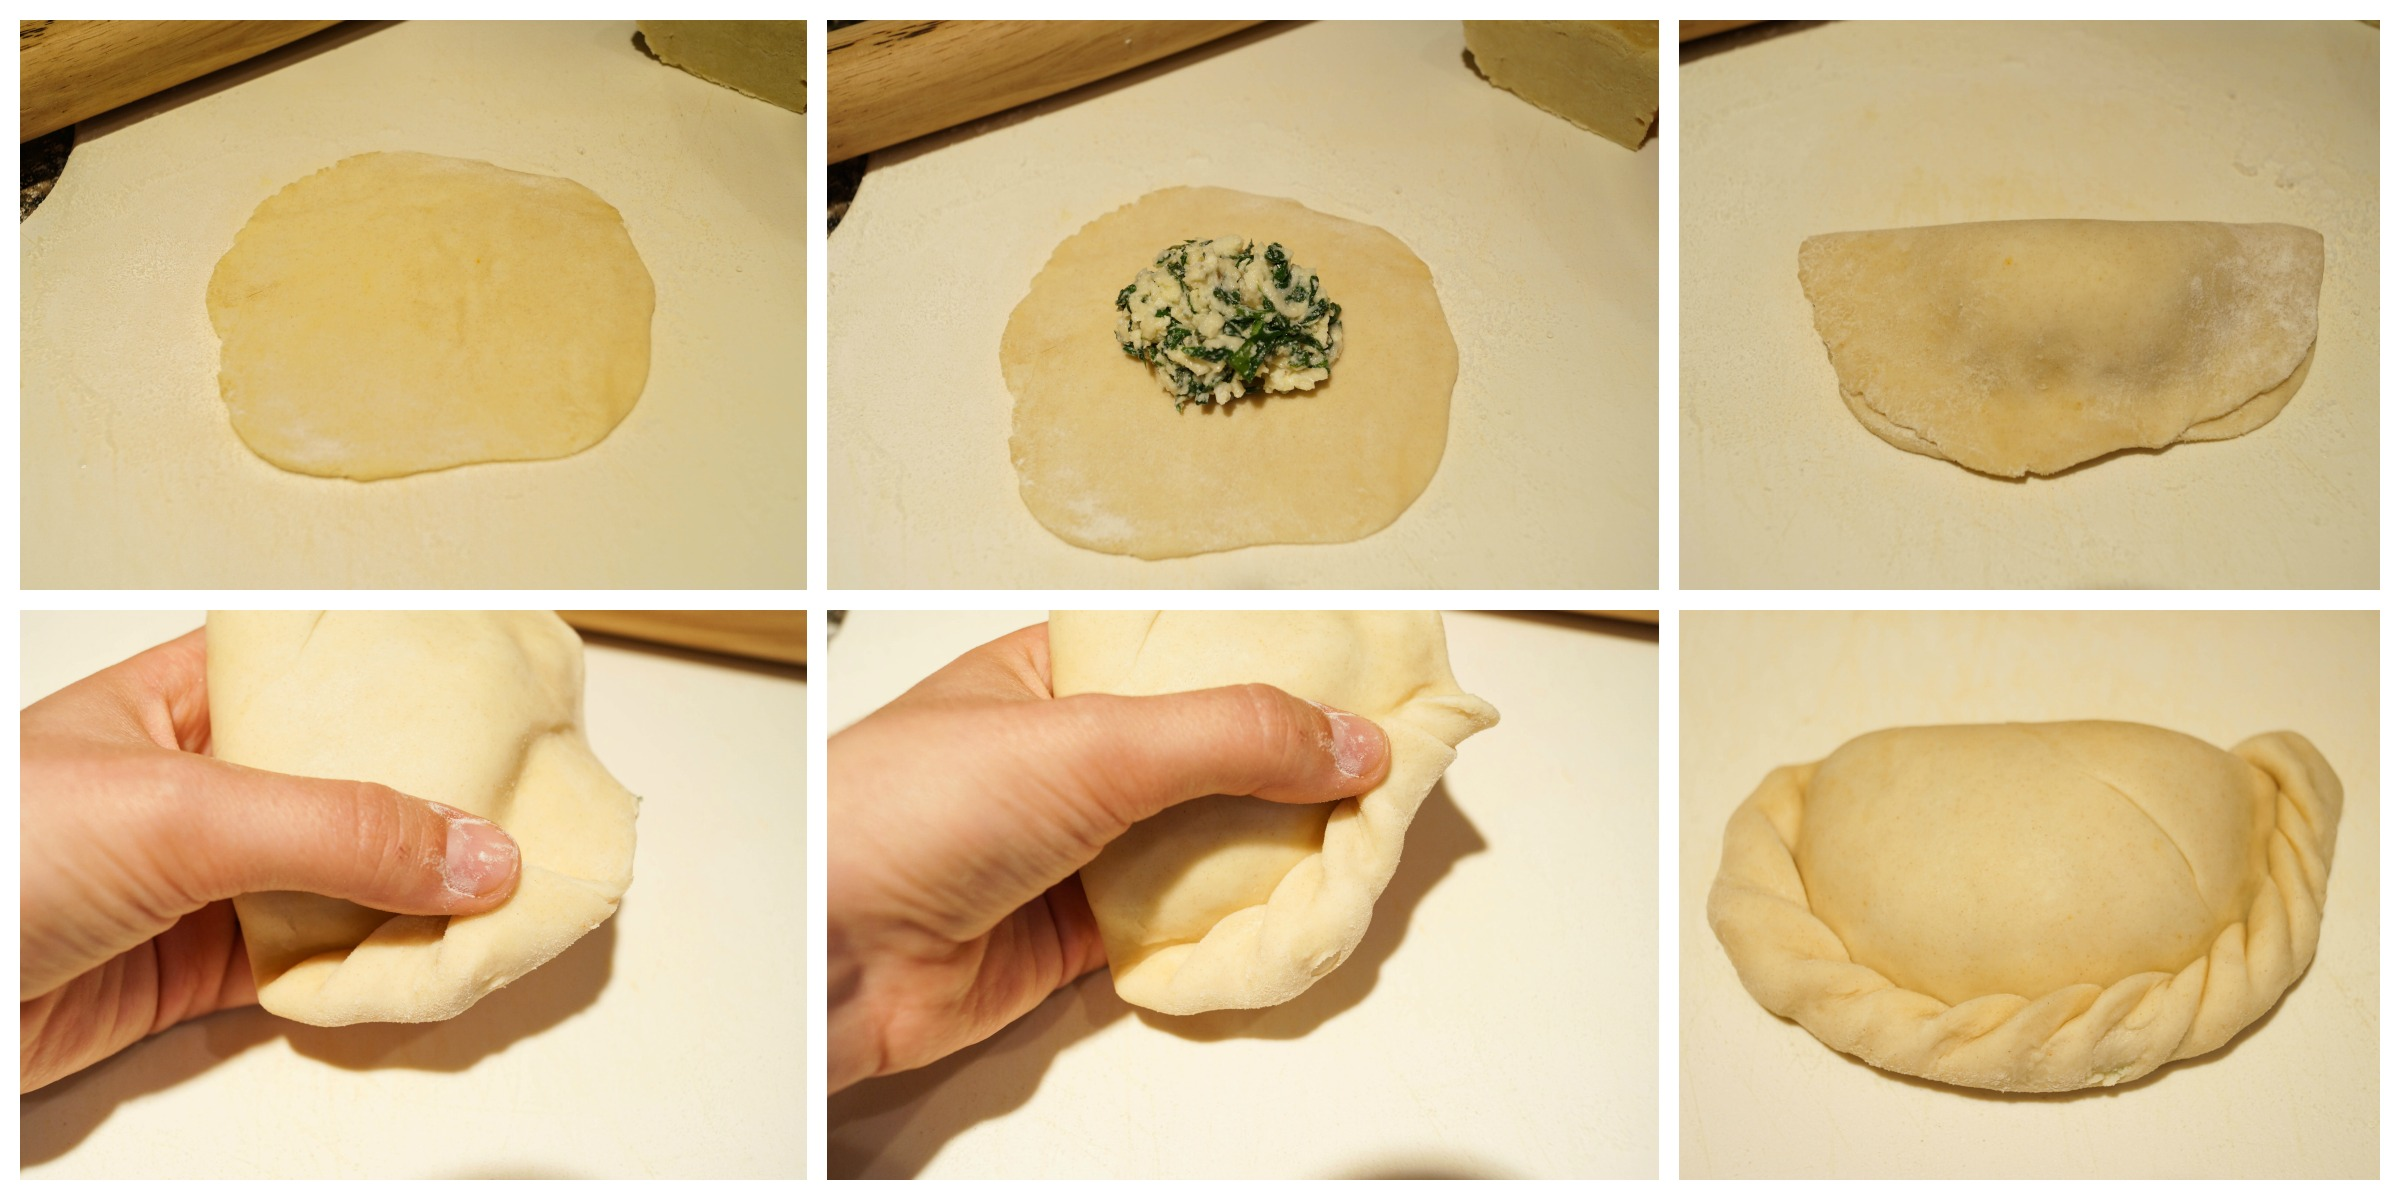 Empanadas de Espinaca (Spinach Empanadas) | Tara's Multicultural Table